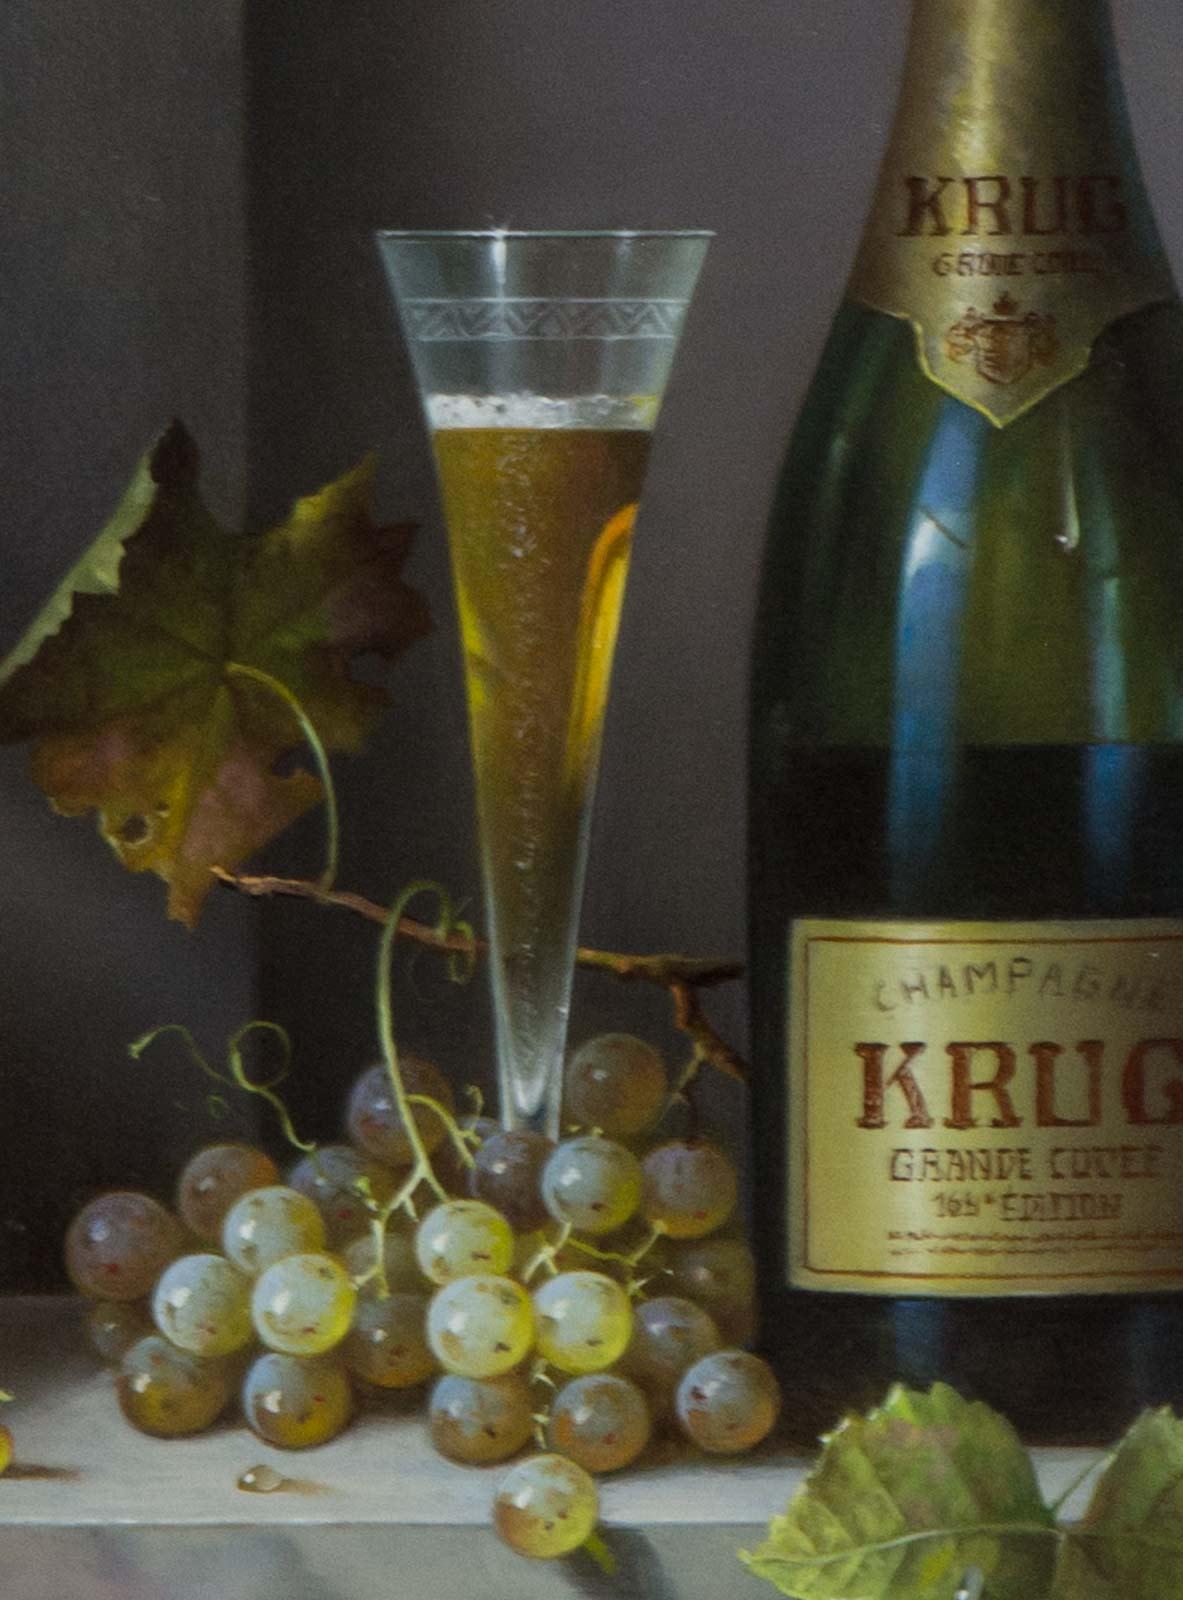 Krug Champagne